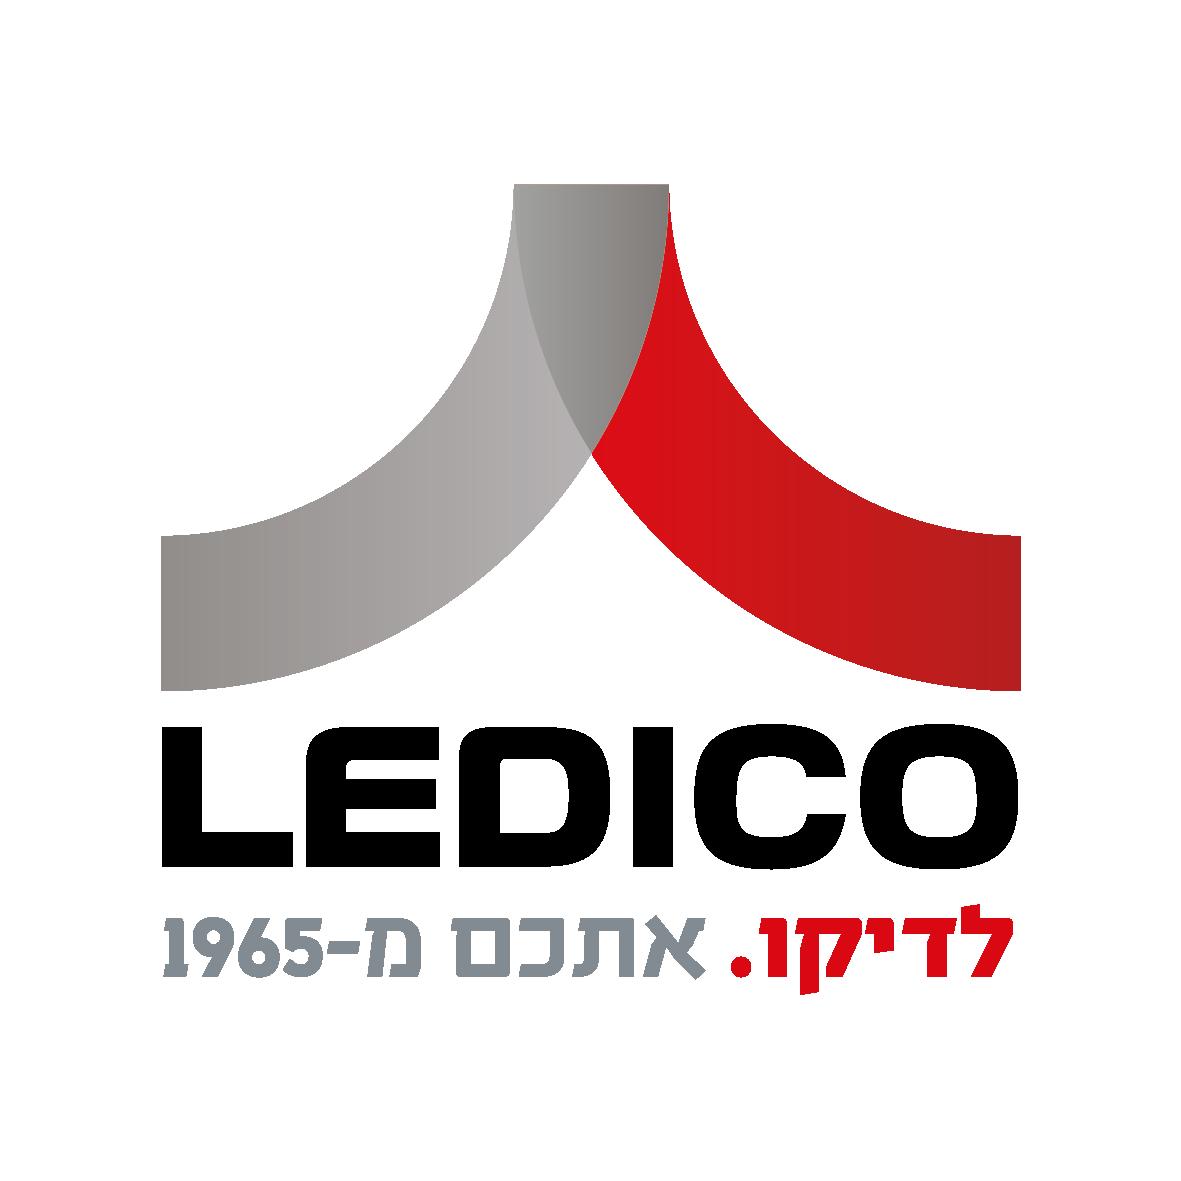 LEDICO Heb. logo-01